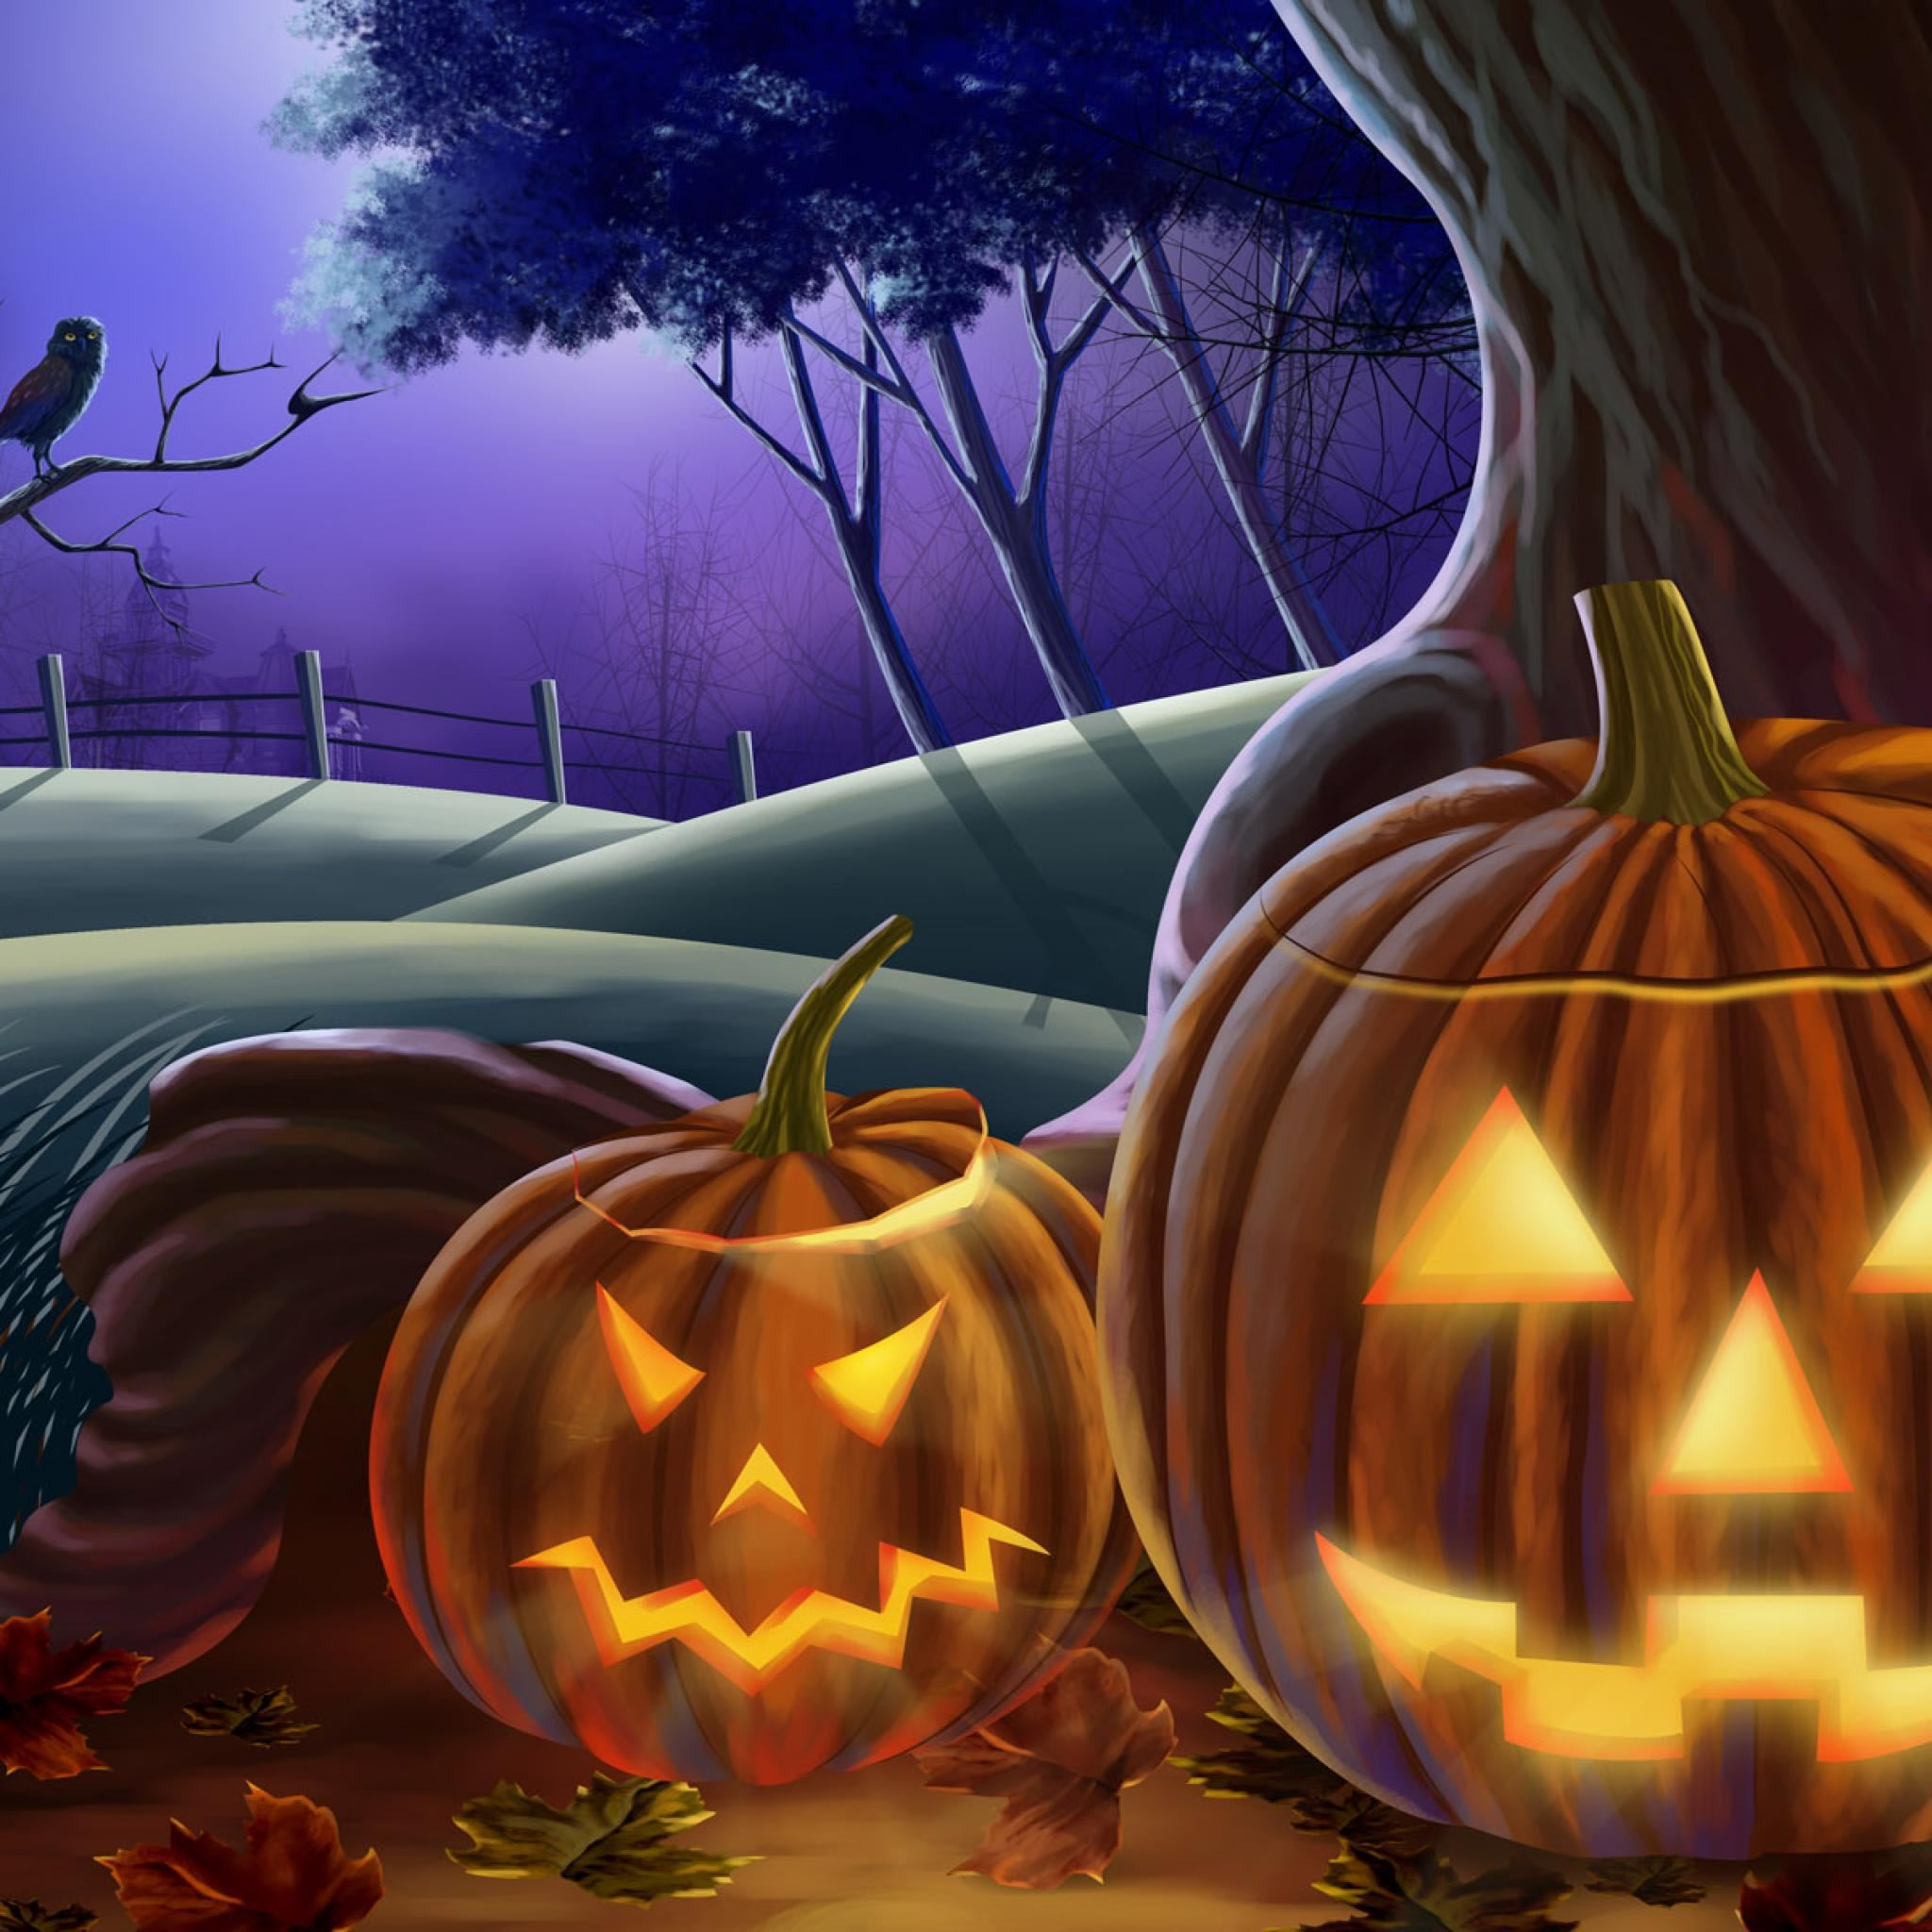 Halloween Pumpkin IPad Air Wallpapers Free Download